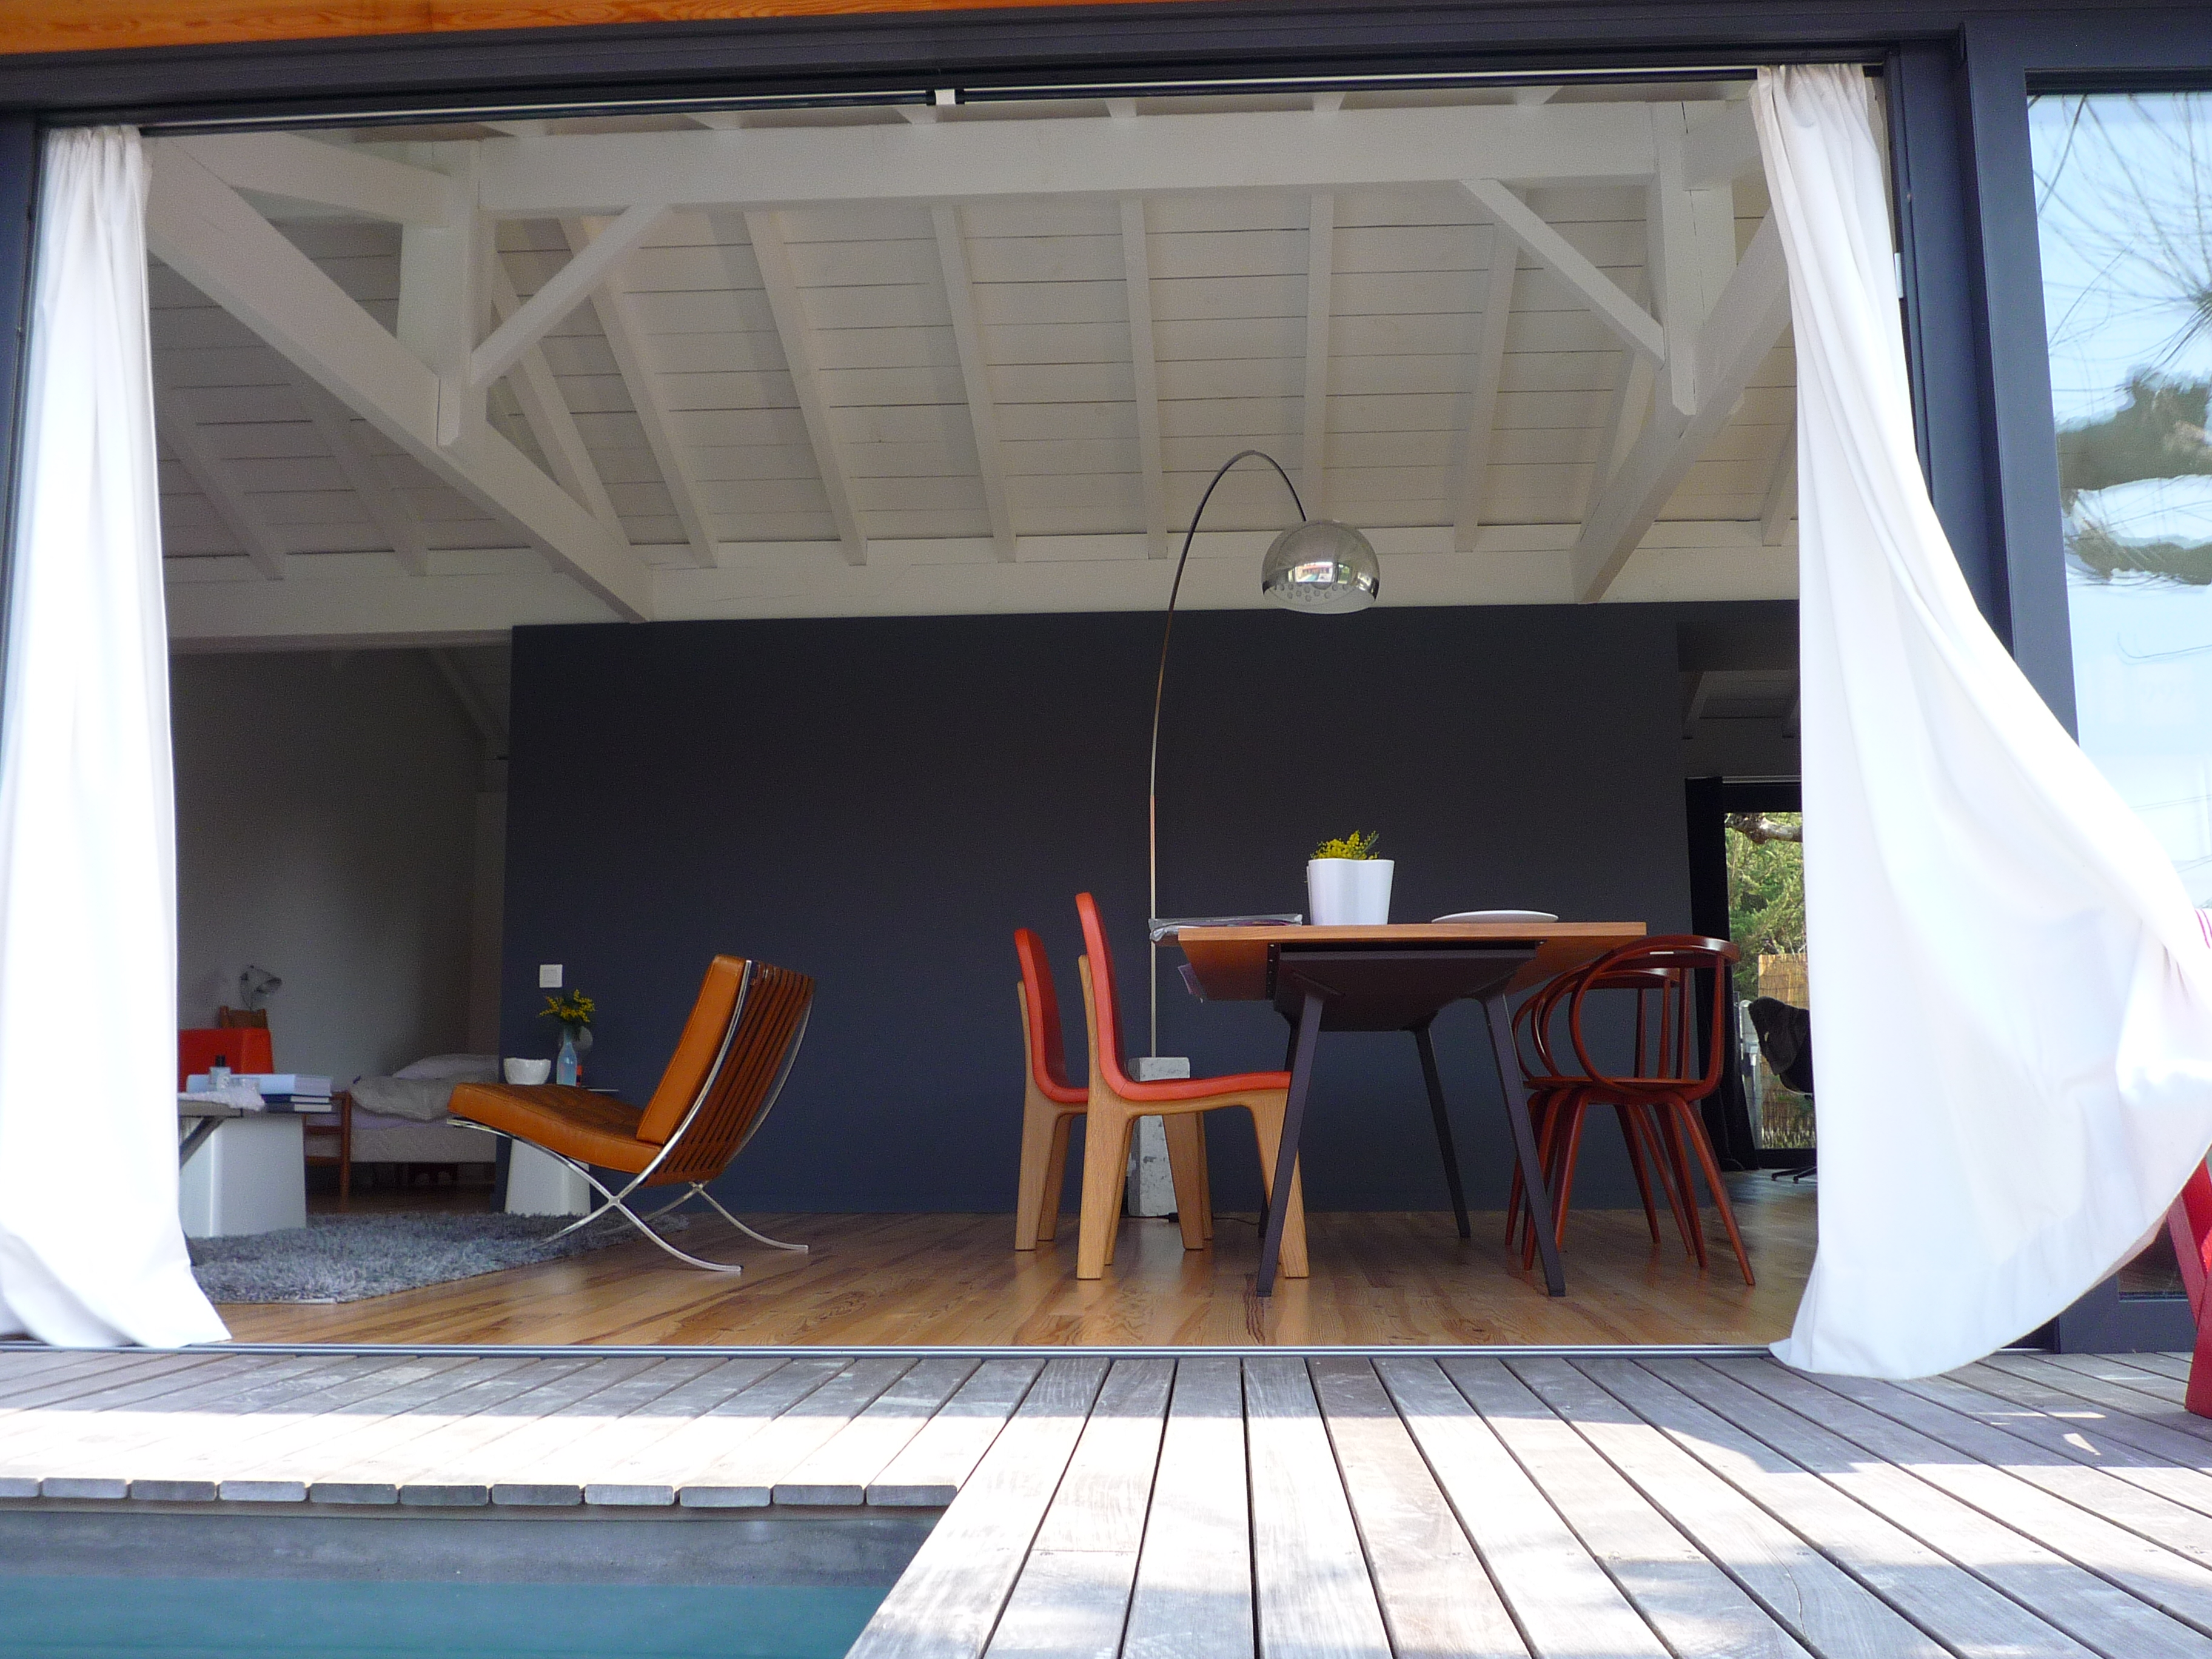 diaporama de david collinet ourthe architecte dplg ordre des architectes. Black Bedroom Furniture Sets. Home Design Ideas